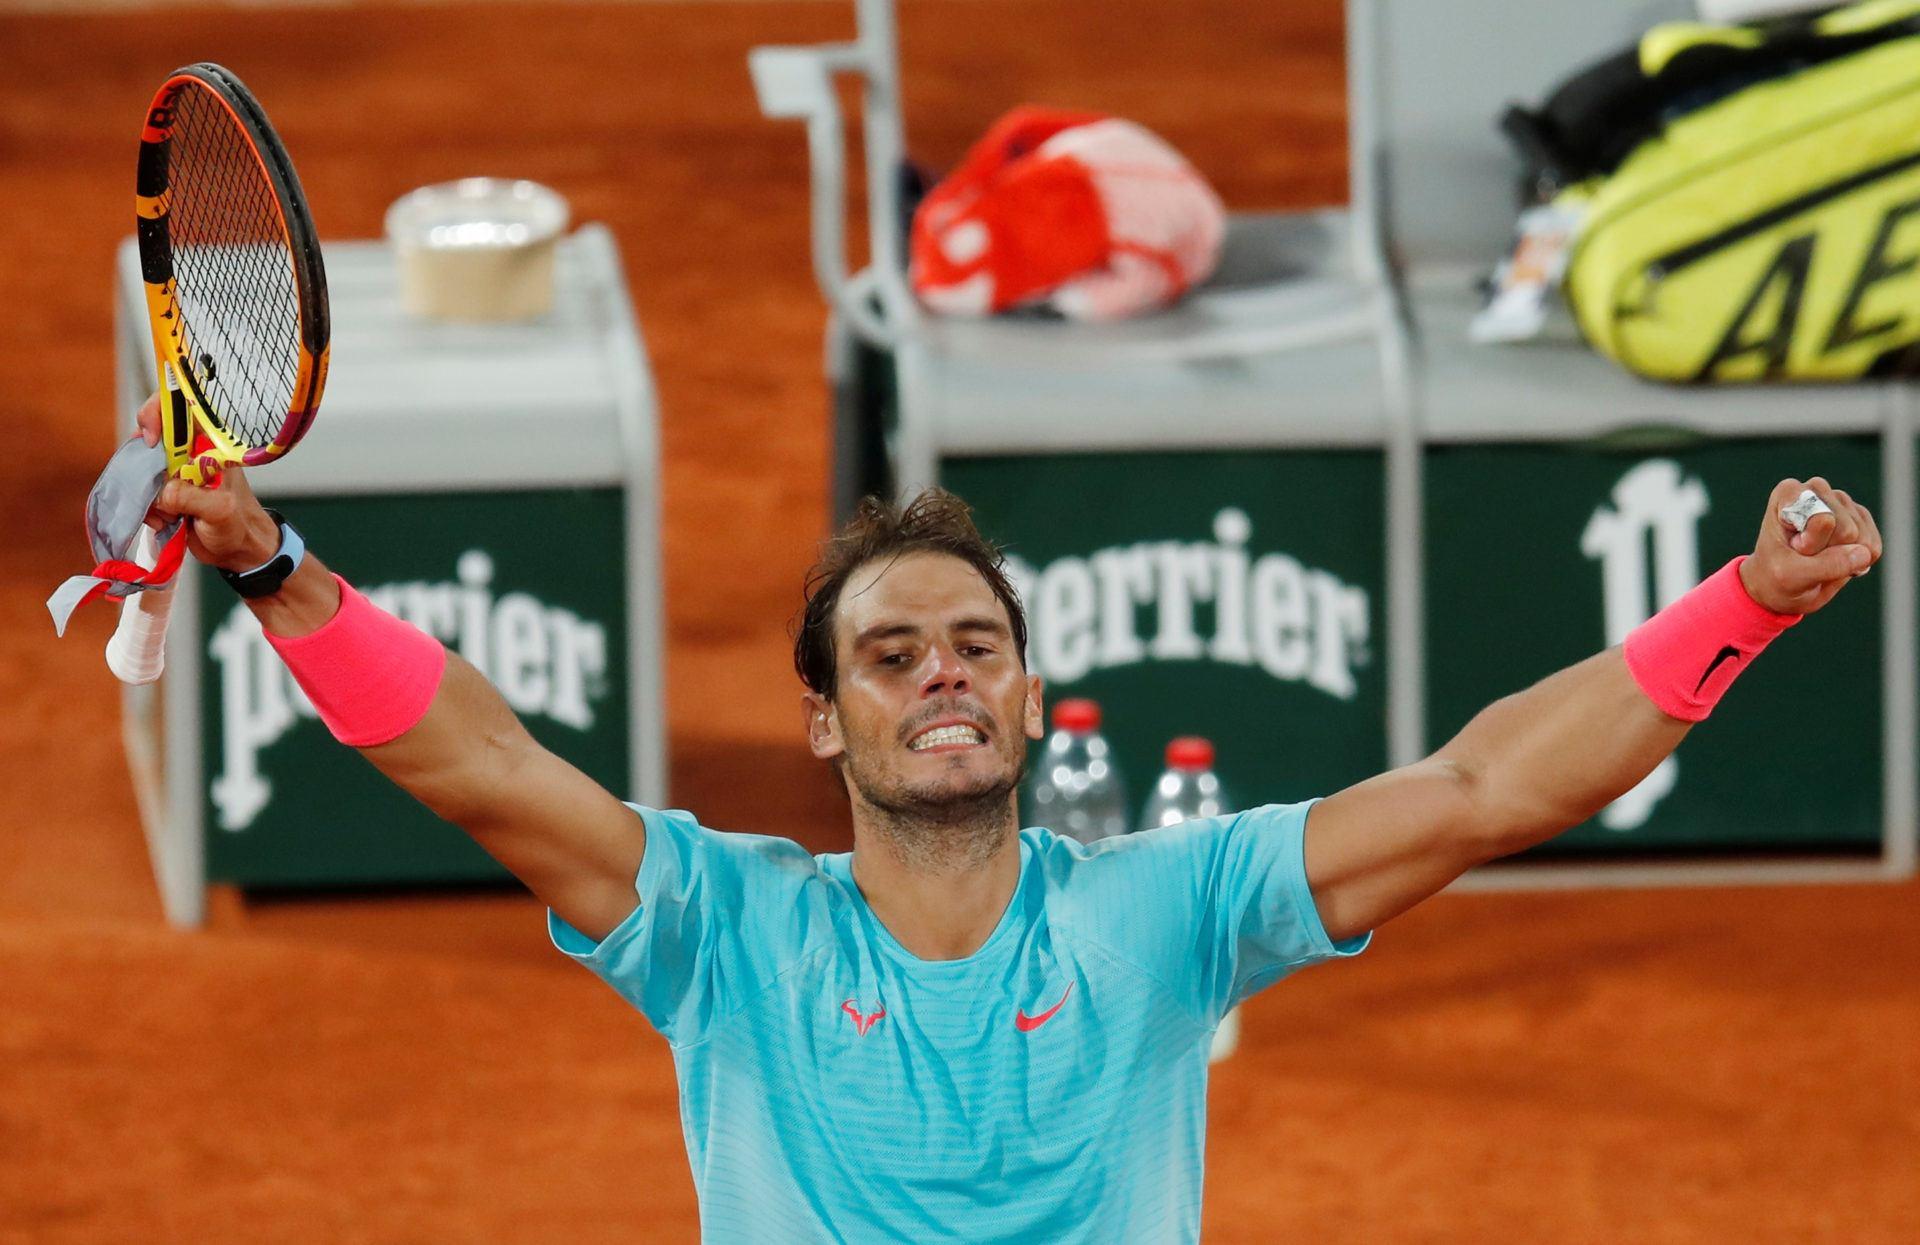 French Open odds Nadal Schwartzman Djokovic Tsitsipas